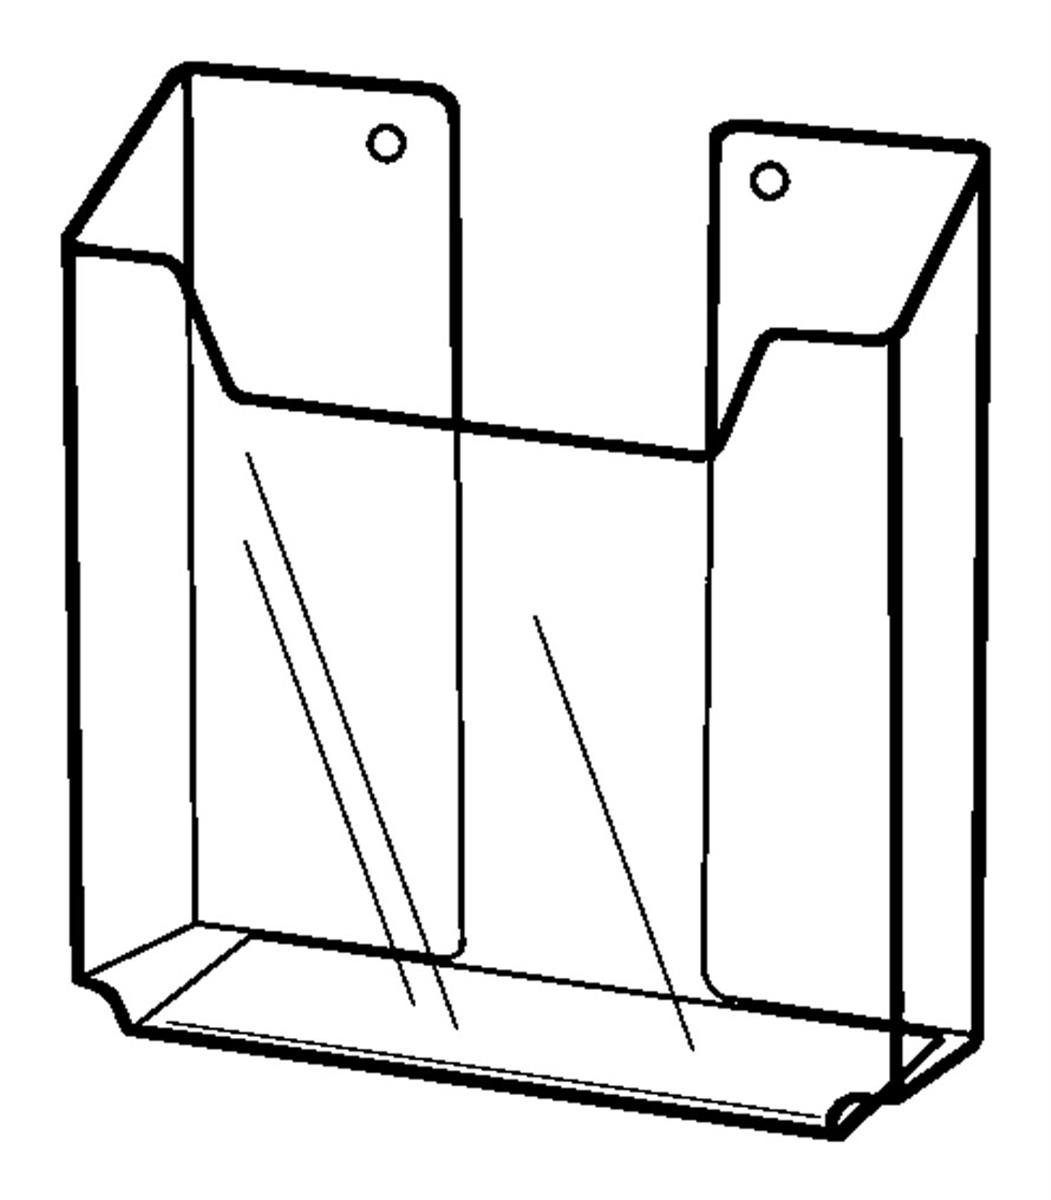 "Plymor Acrylic 2-Shelf CD//DVD Display Shelving 21.25/"" H x 24.5/"" W x 8.25/"" D"